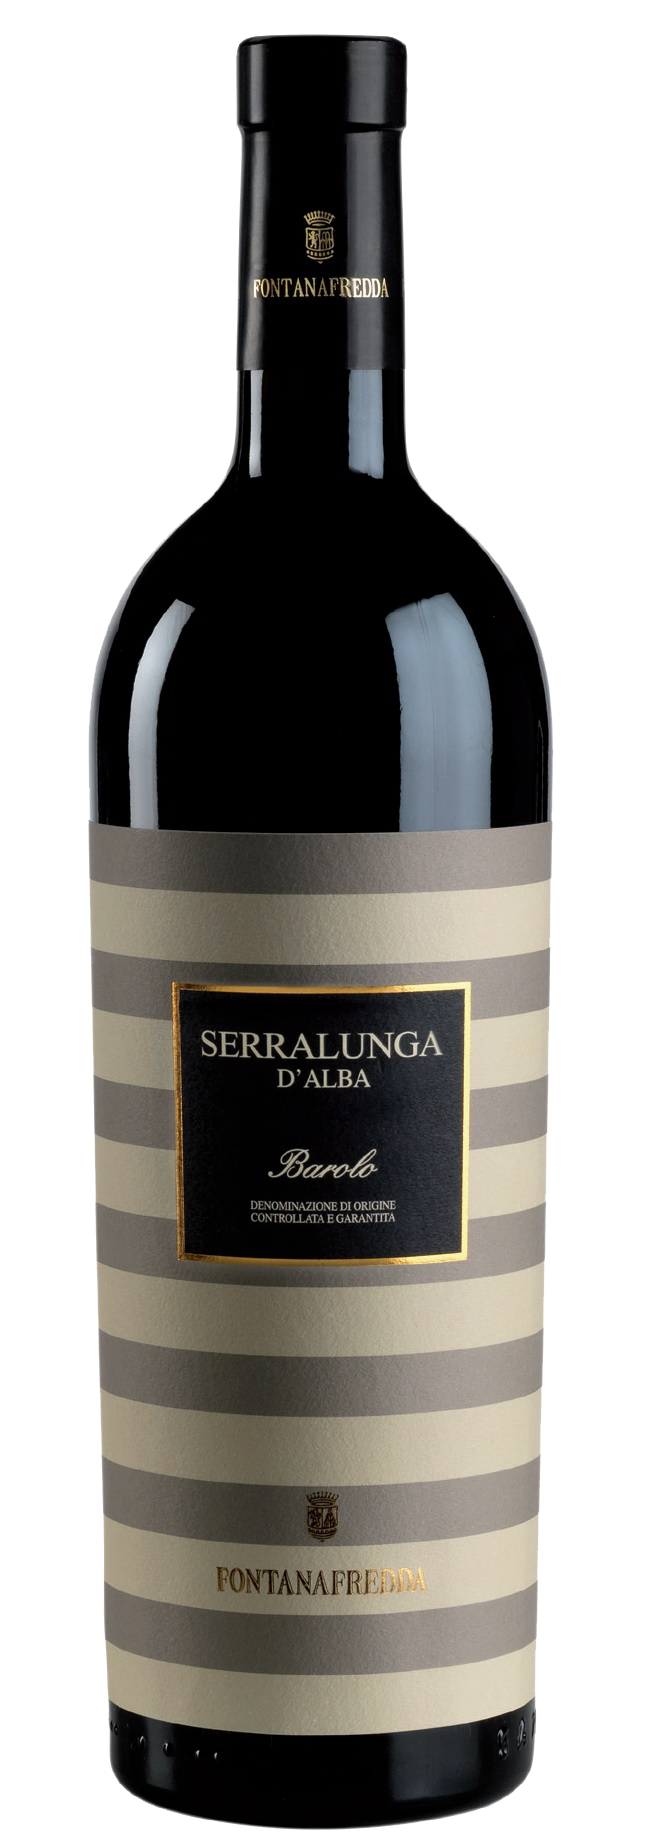 Barolo Seralunga d'Alba 0,75 L